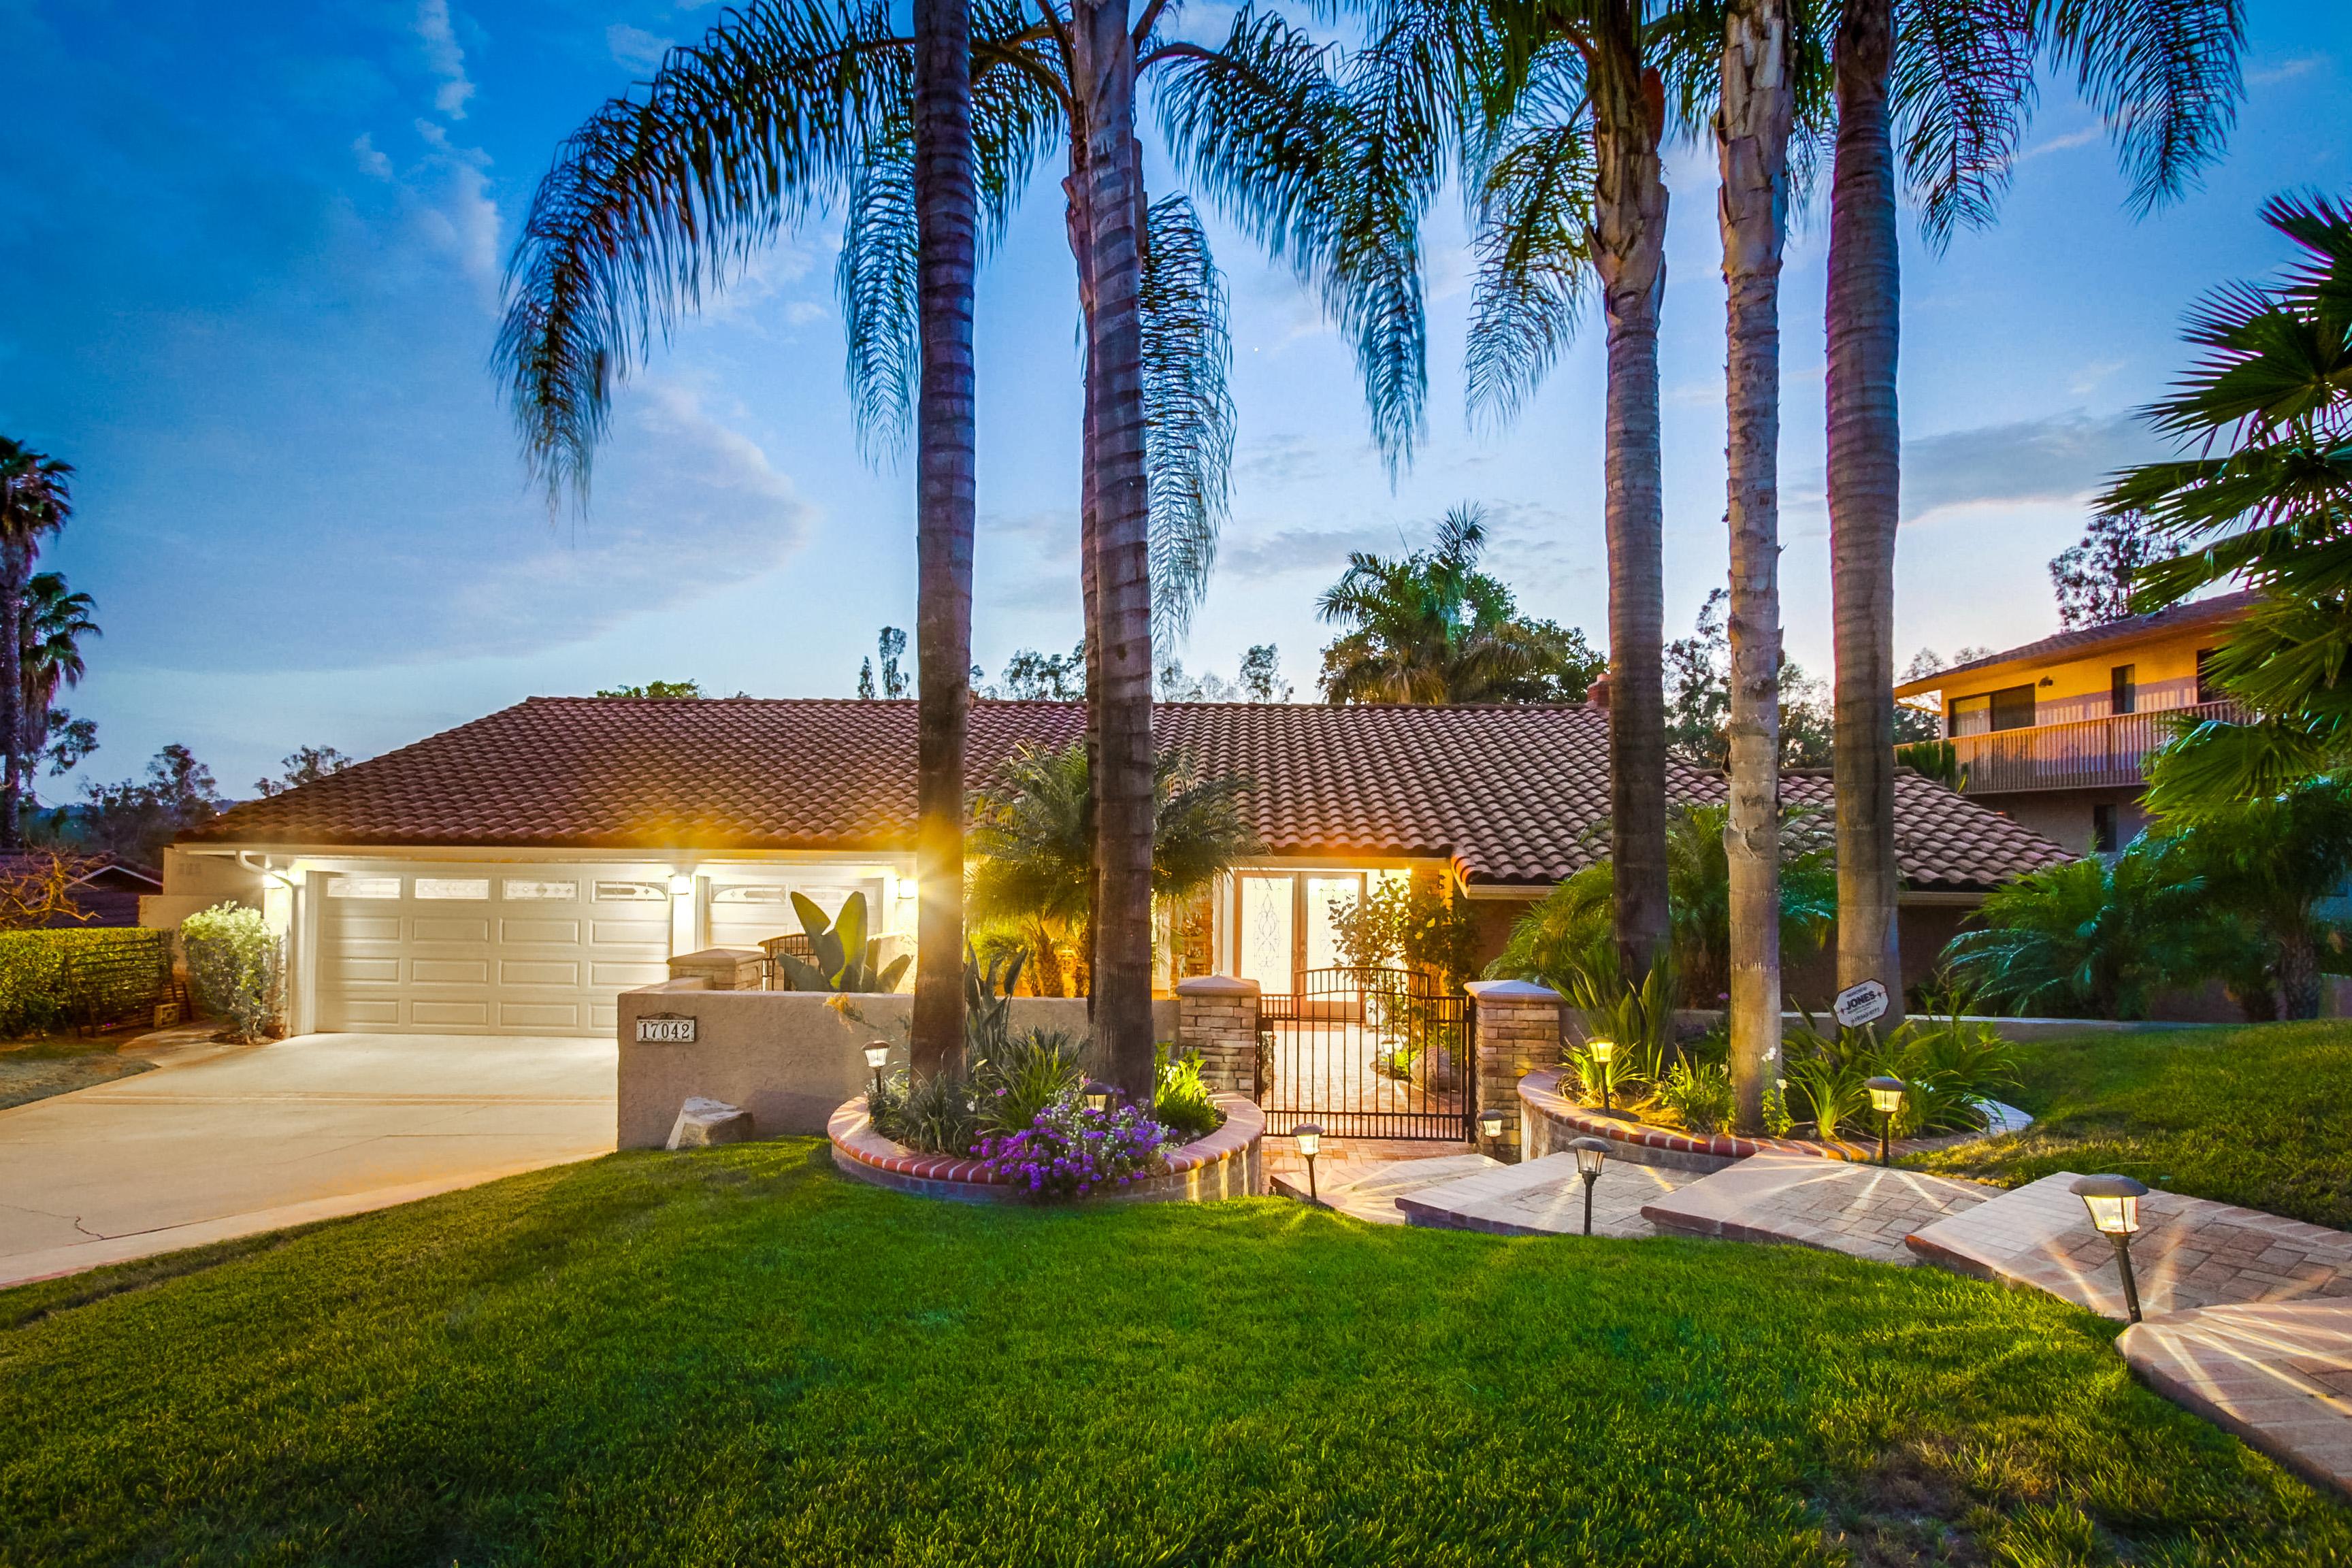 17402 Cloudcroft Drive -  San Diego, CA 92128